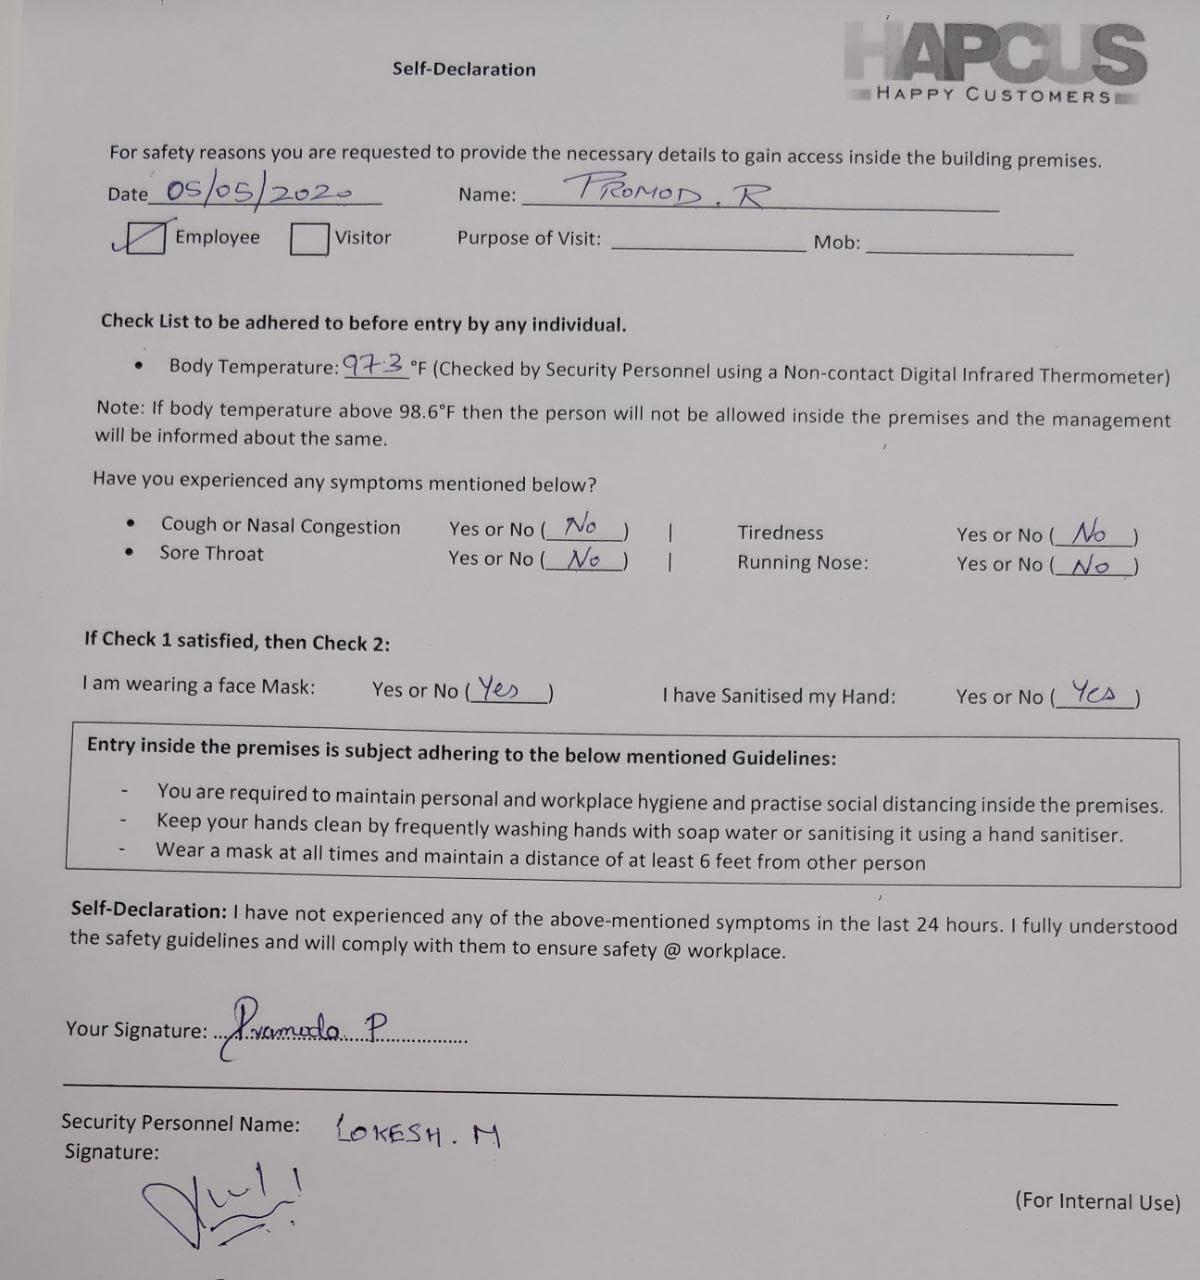 Screening Process - Employee self-declaration form